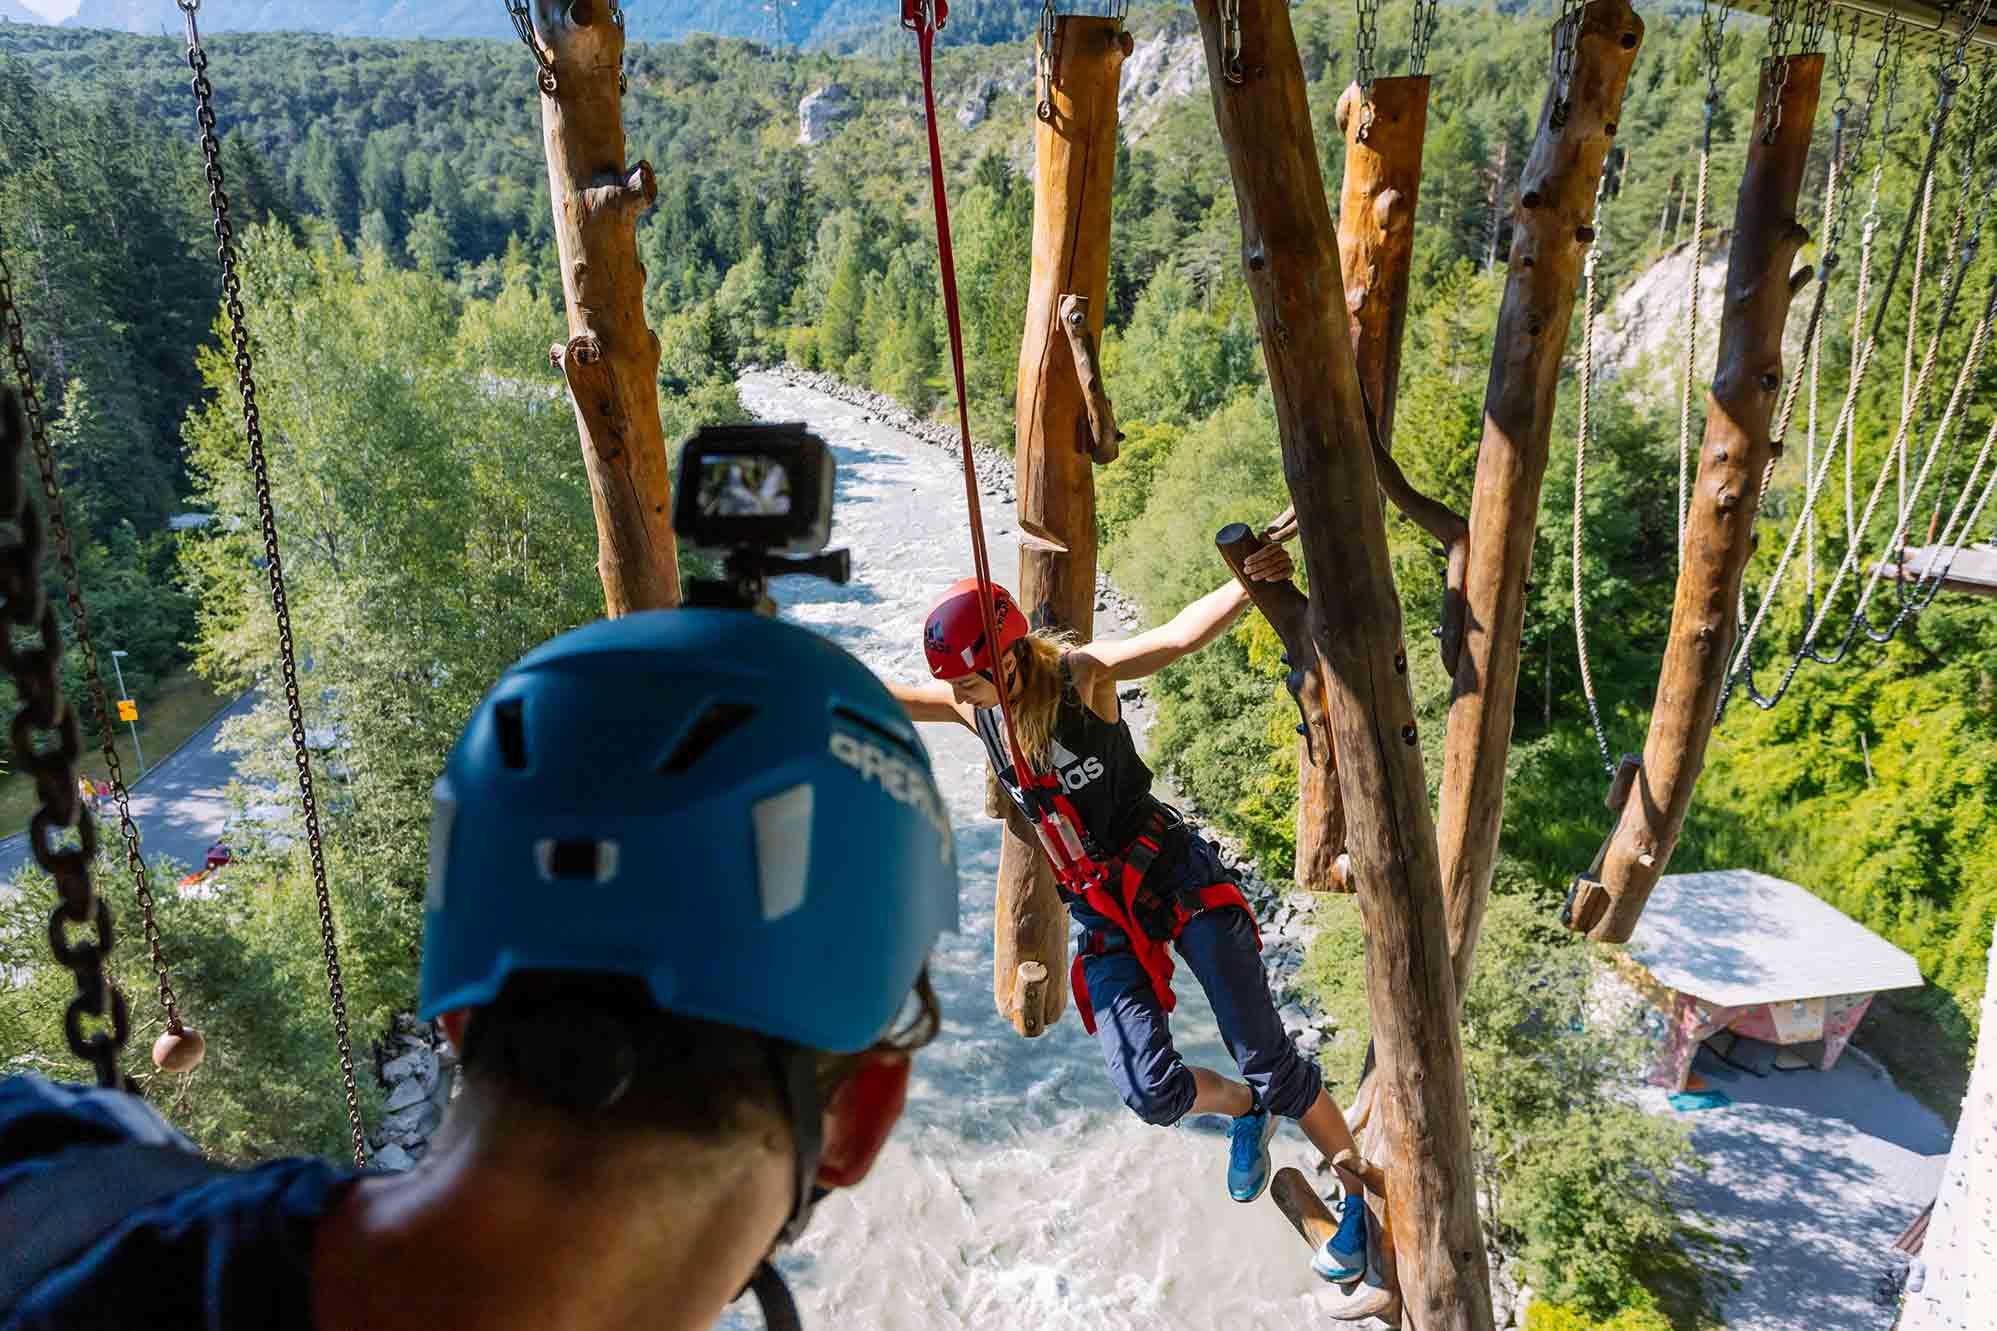 climbing adventures in the austrian alps